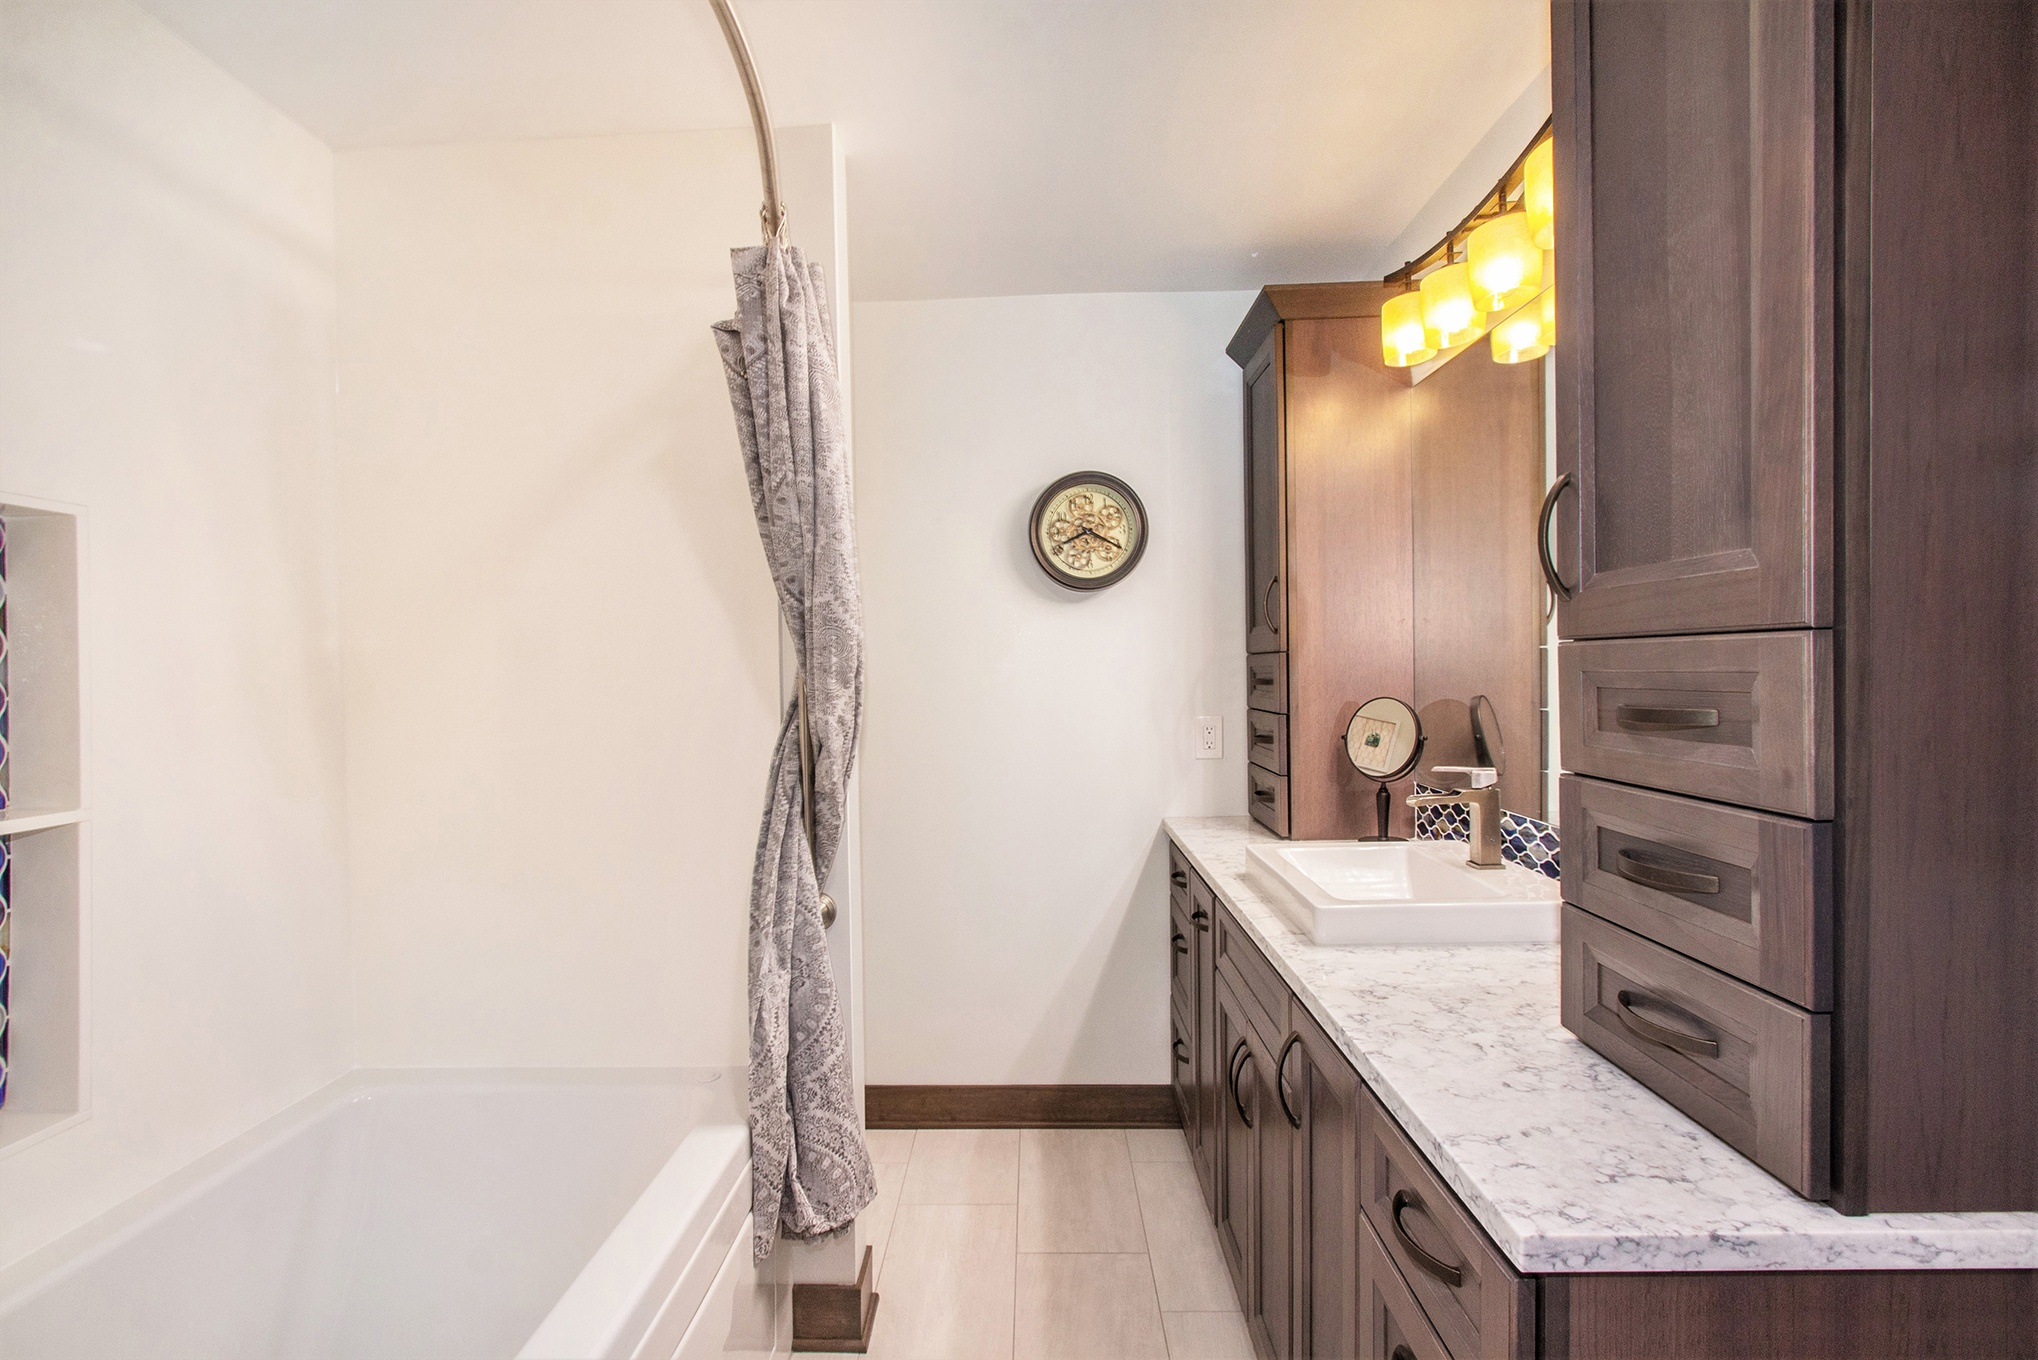 Pratt Lake Bathroom Vanity With Cabinets